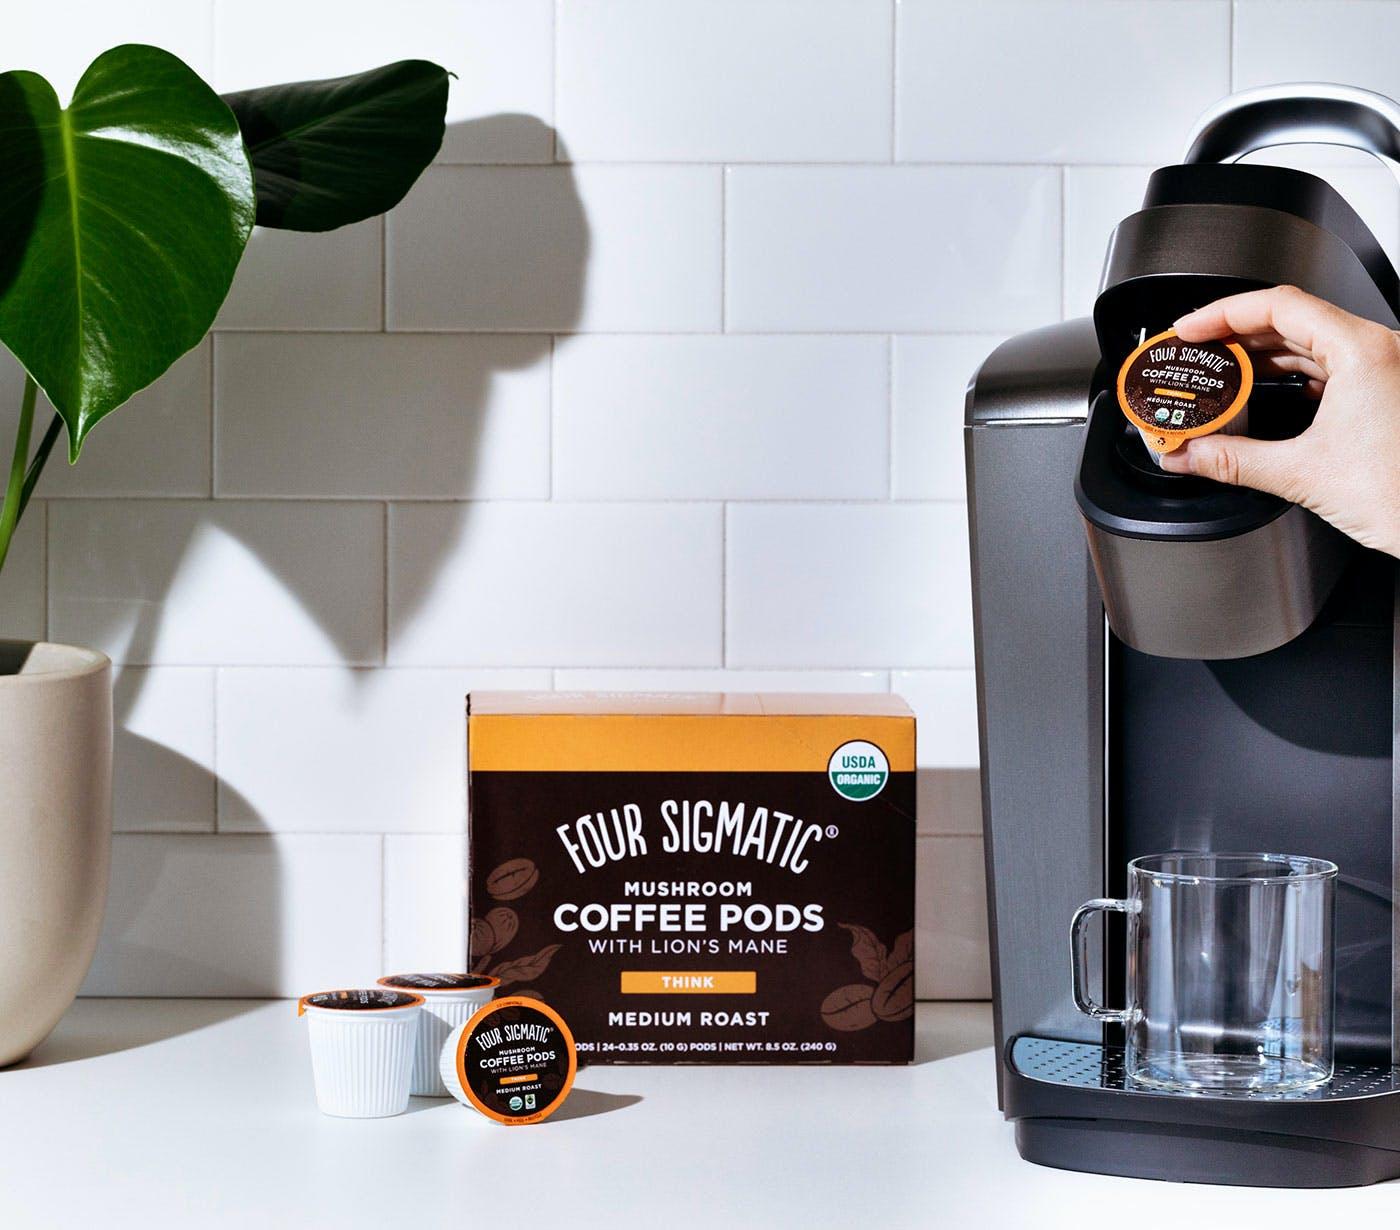 Four Sigmatic Mushroom Coffee Pods